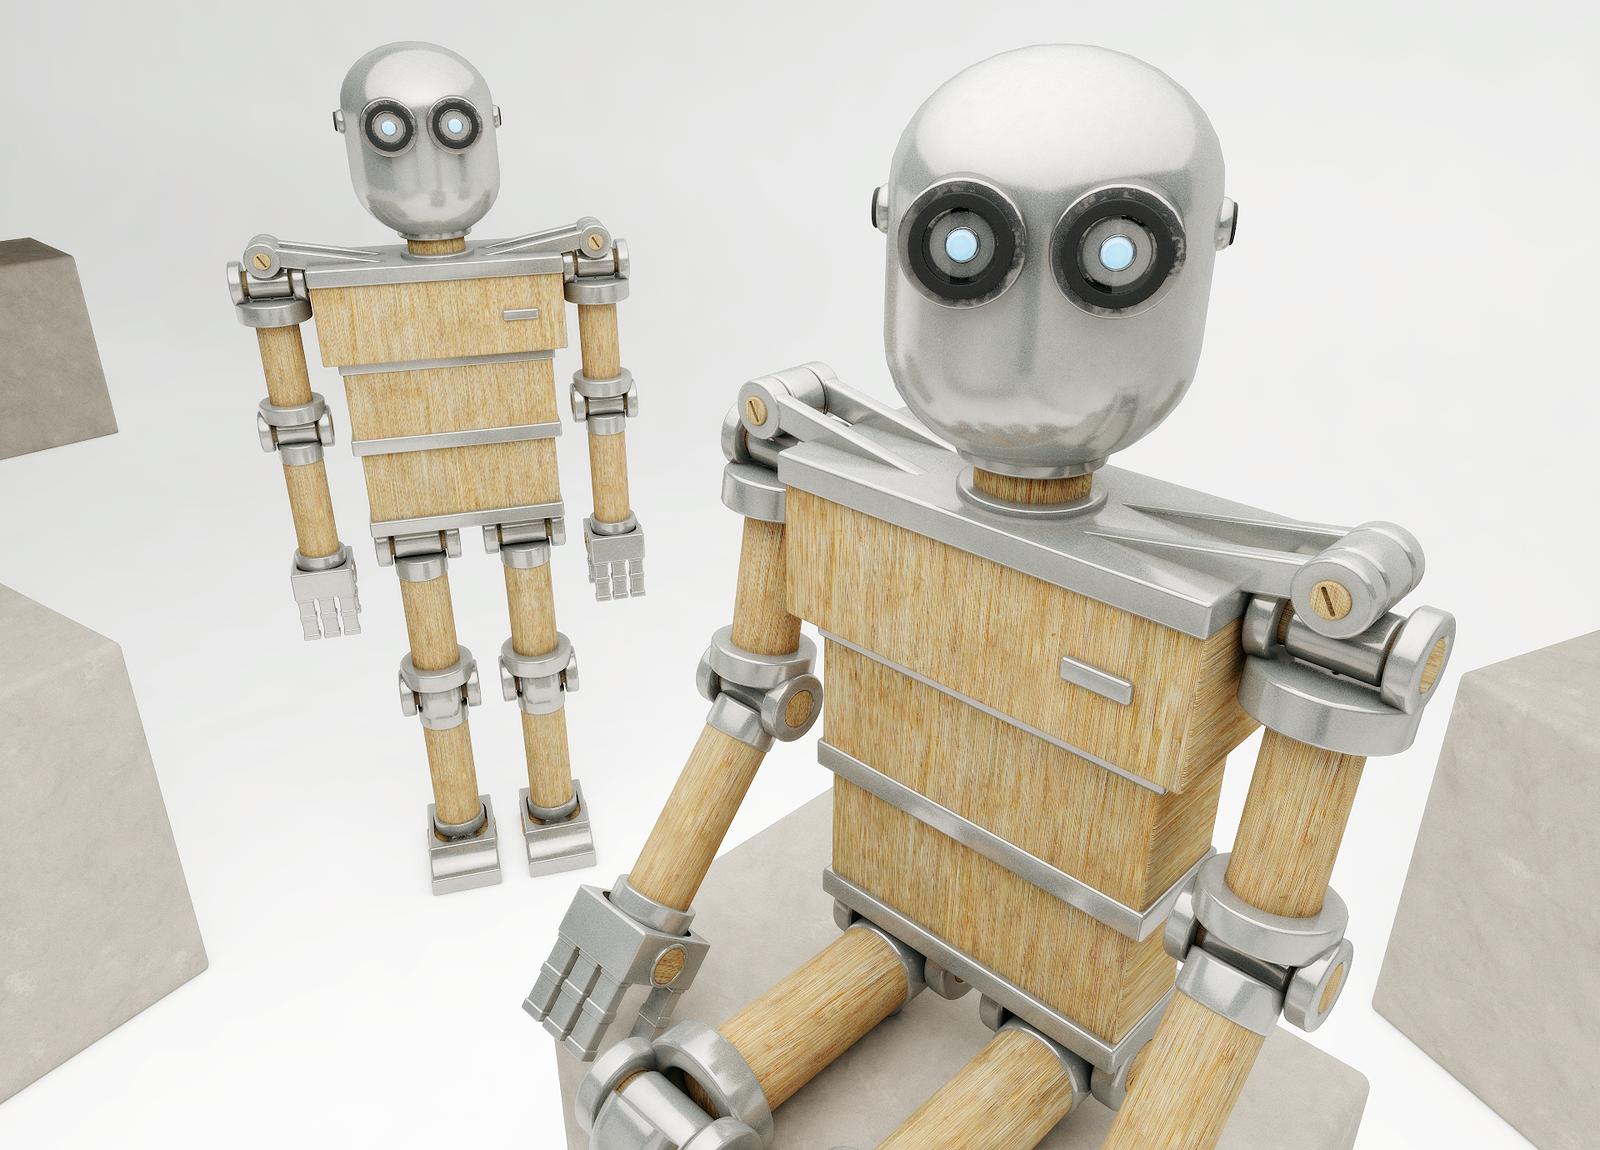 woodrobot-pencilholder-byeduardogalvani-.png